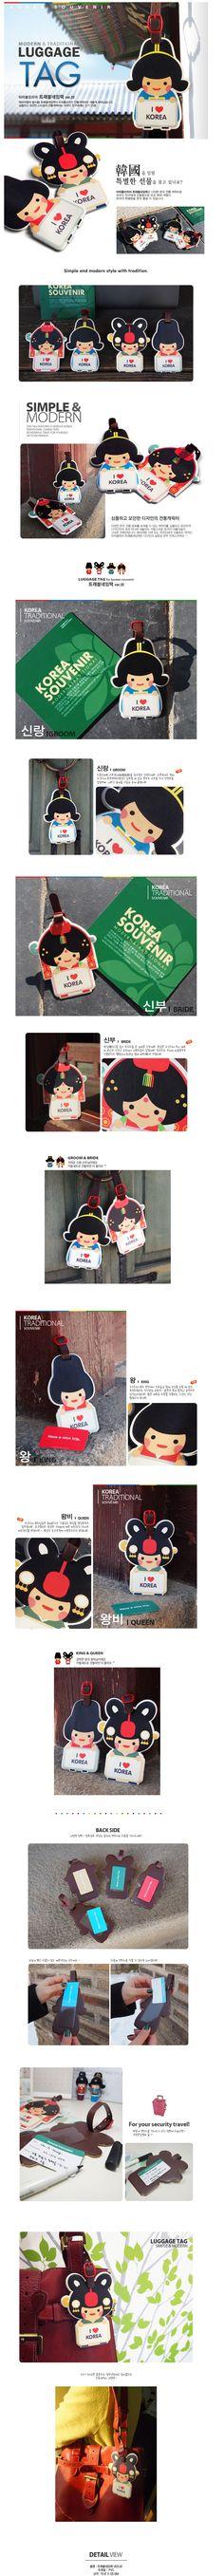 miracle korea-name tag $9.50 on kstargoods.com